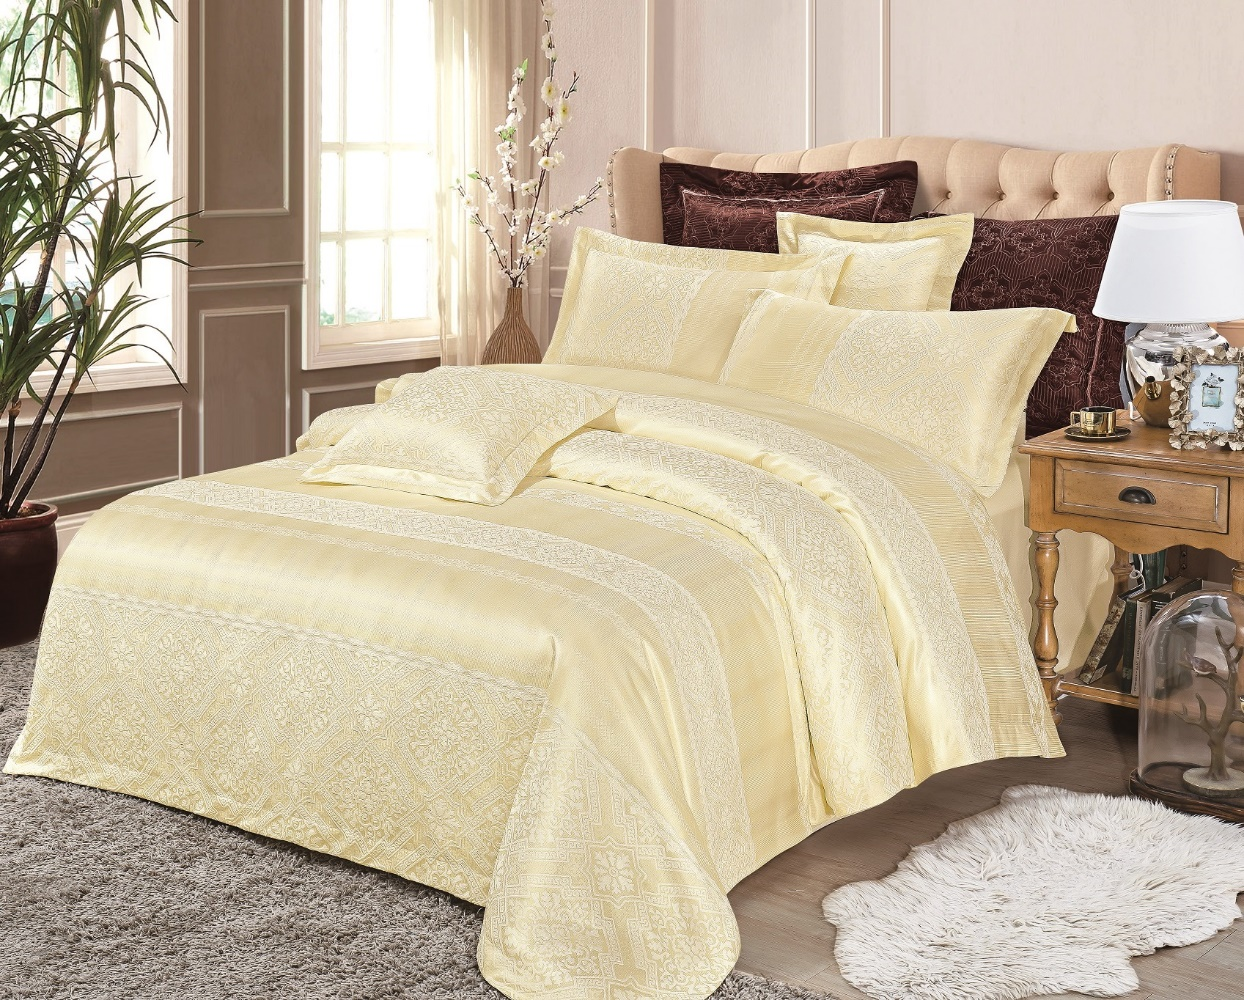 Bed will Belet Satin Jacquard Elit 238 - Duet